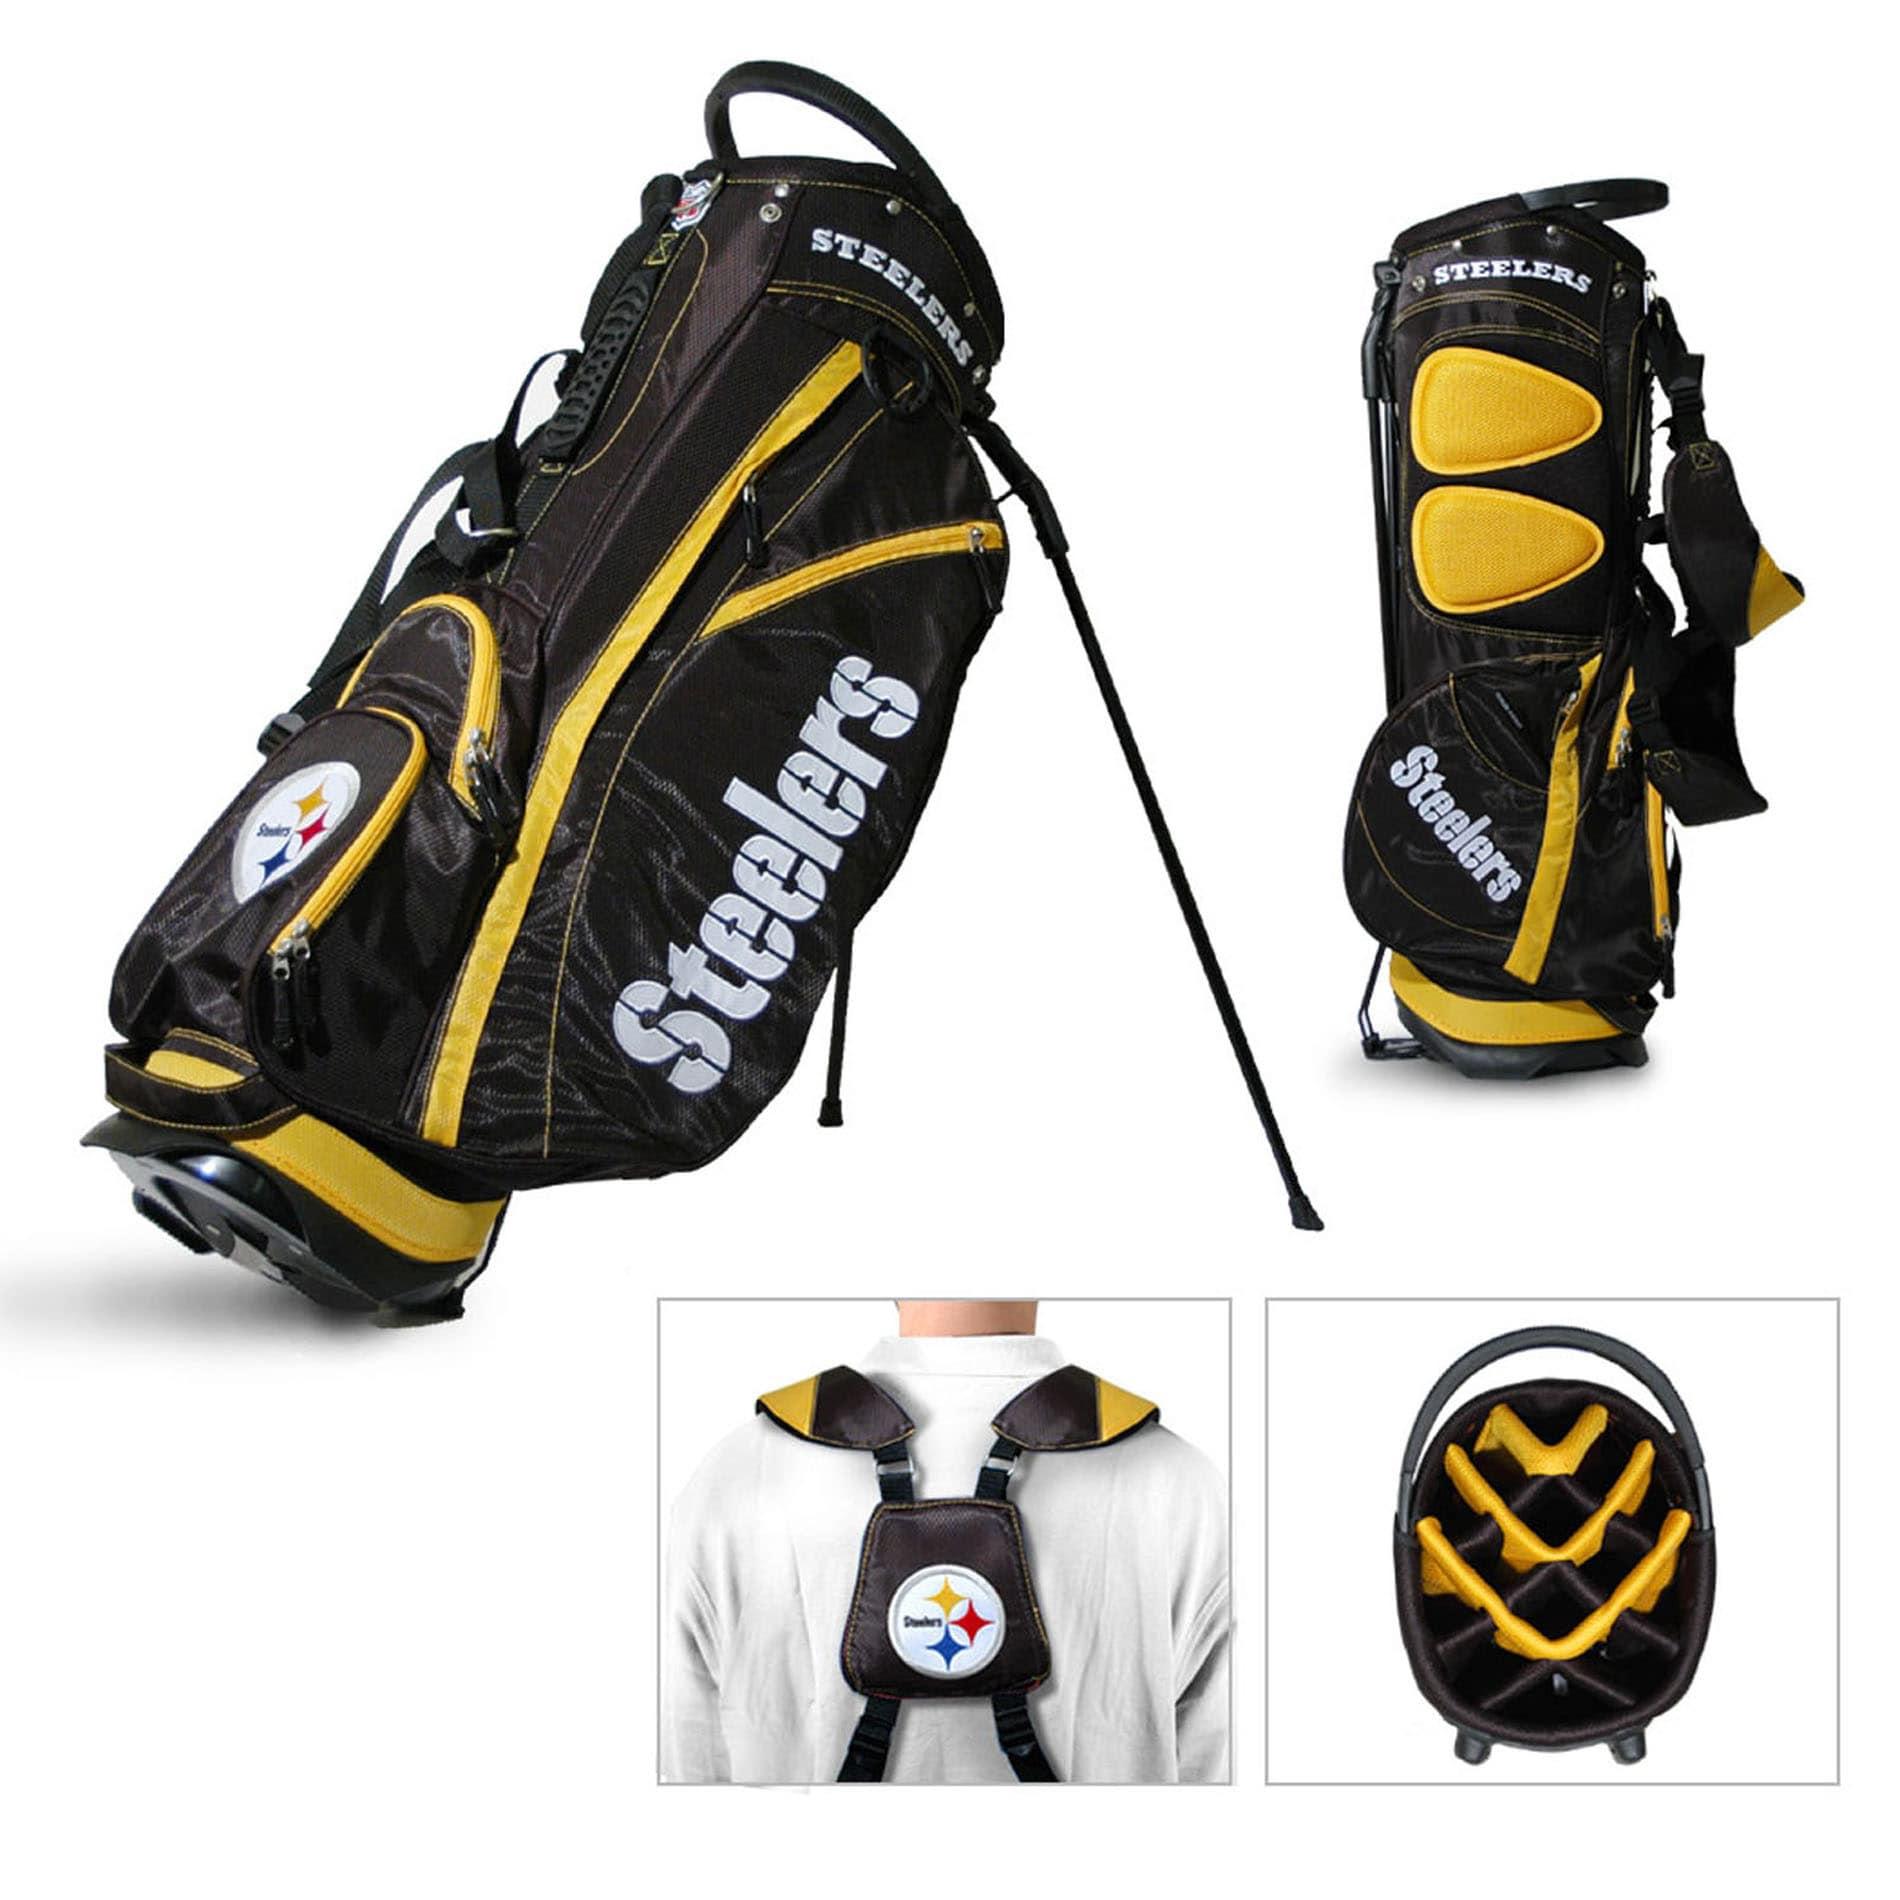 Pittsburgh Steelers NFL Fairway Stand Golf Bag